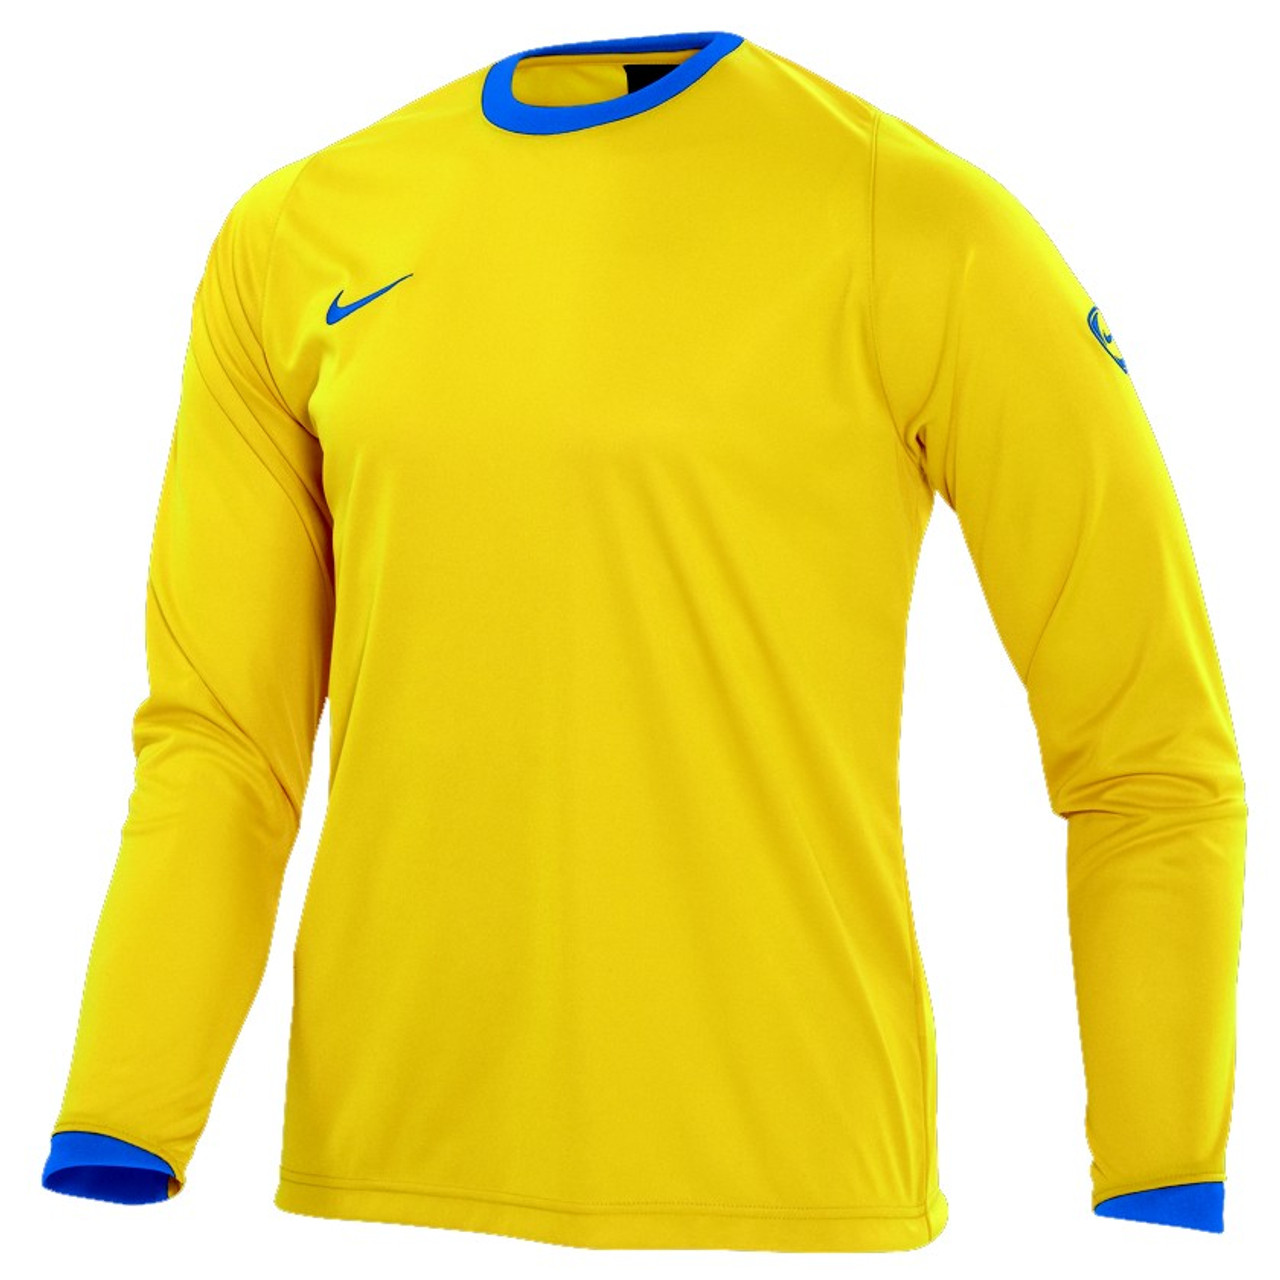 d69ac6fe02d0 Nike Park Game Jersey ADULTS - Varsity Maize Royal Blue - BigWight